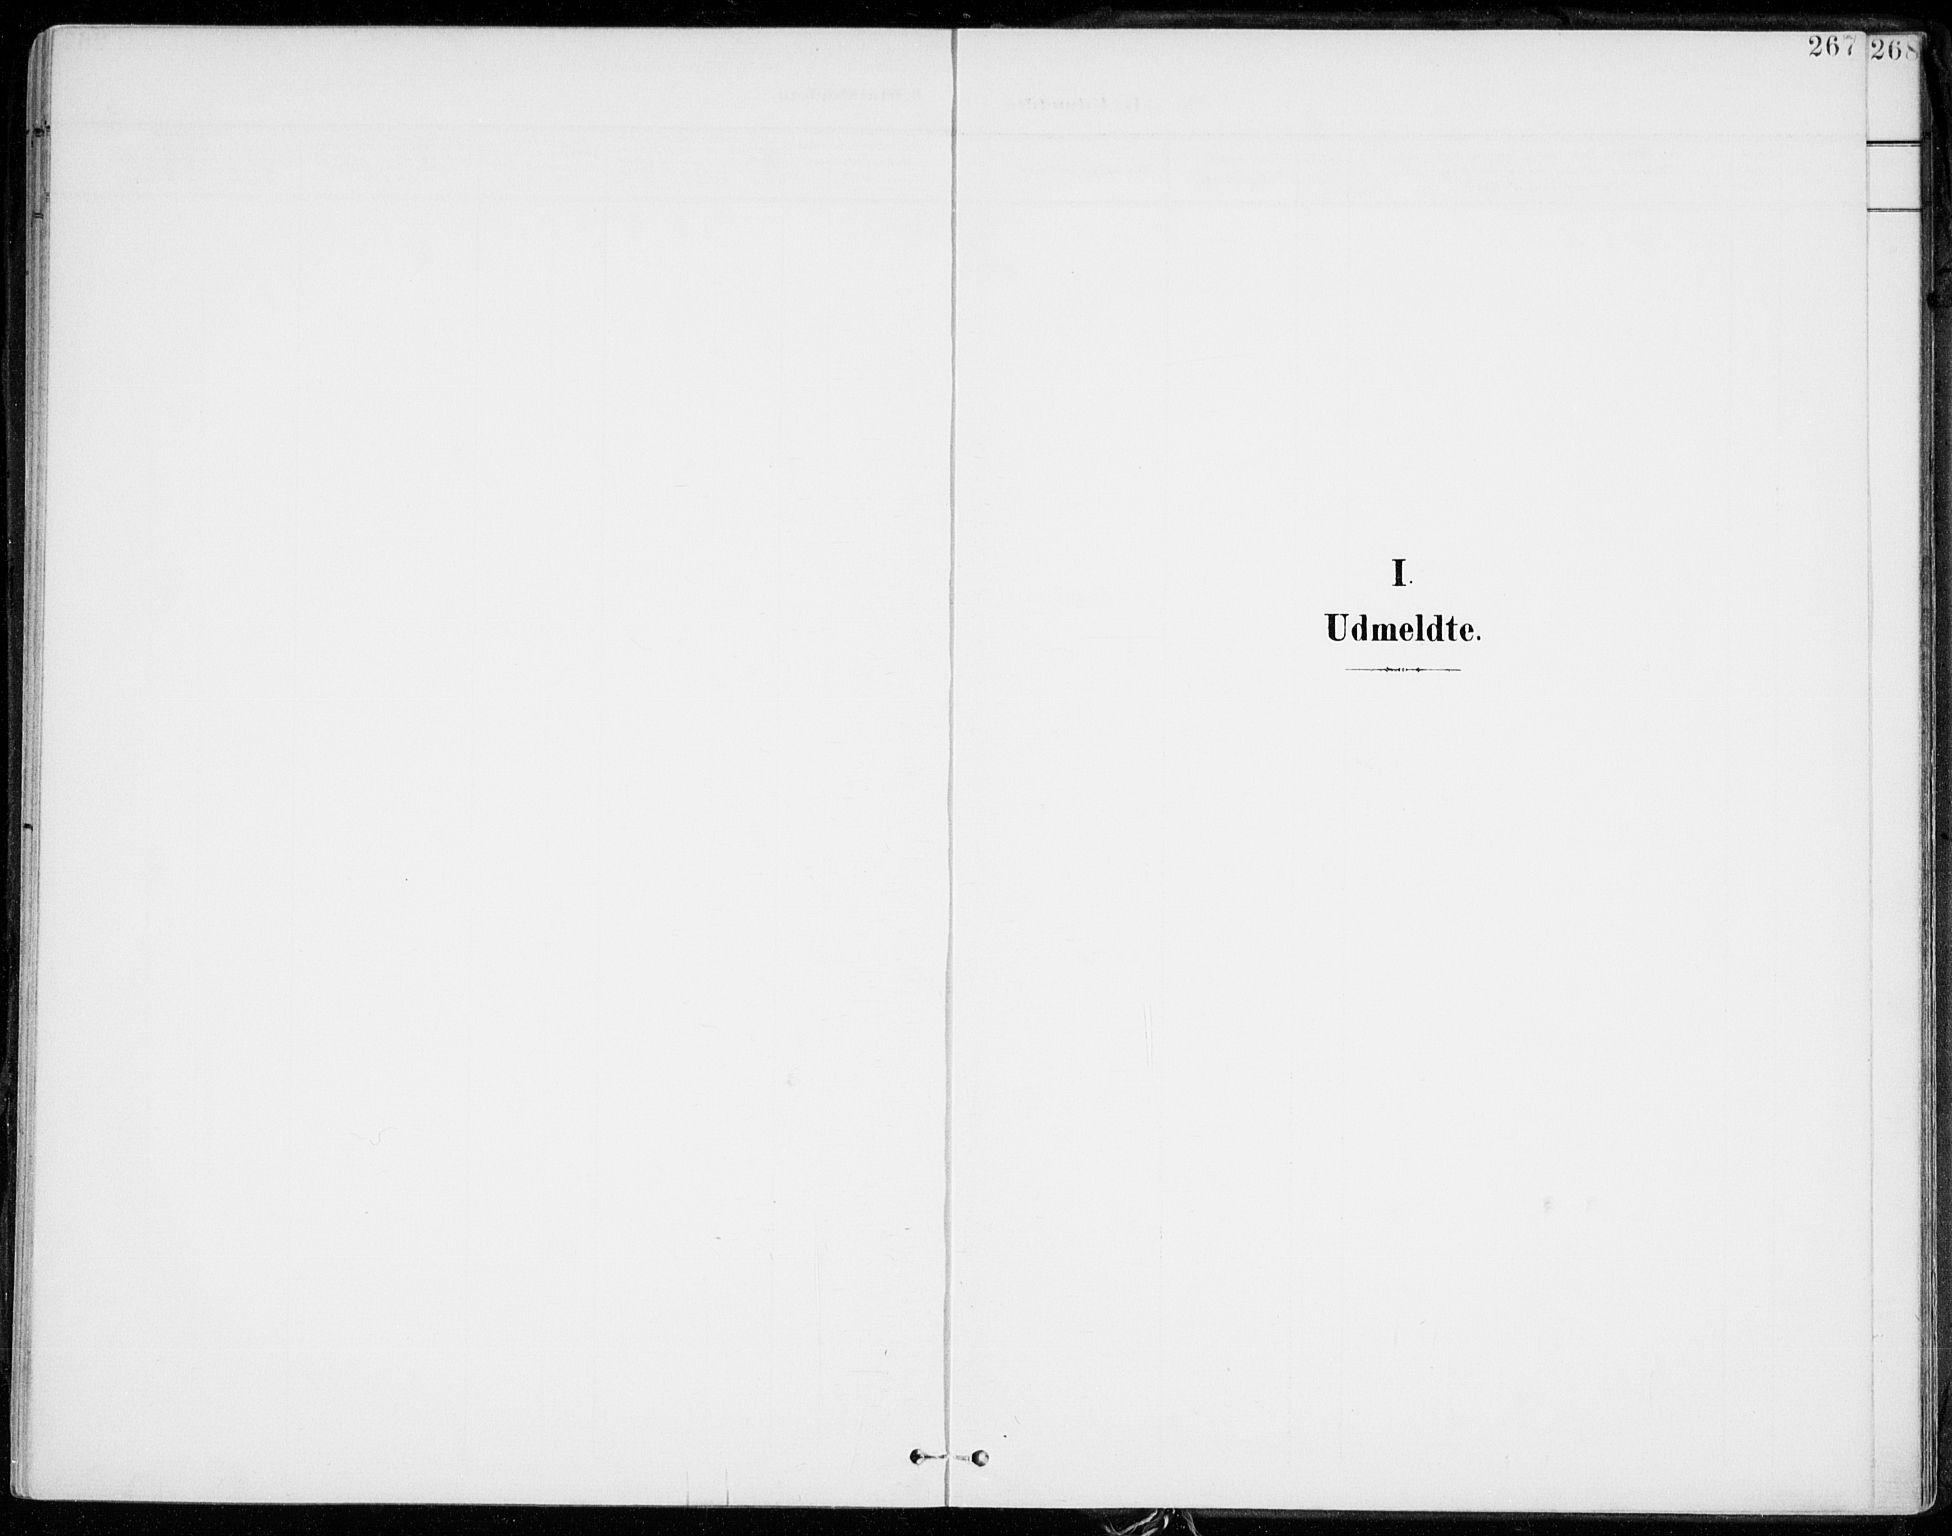 SATØ, Lenvik sokneprestembete, H/Ha: Ministerialbok nr. 14, 1899-1909, s. 267